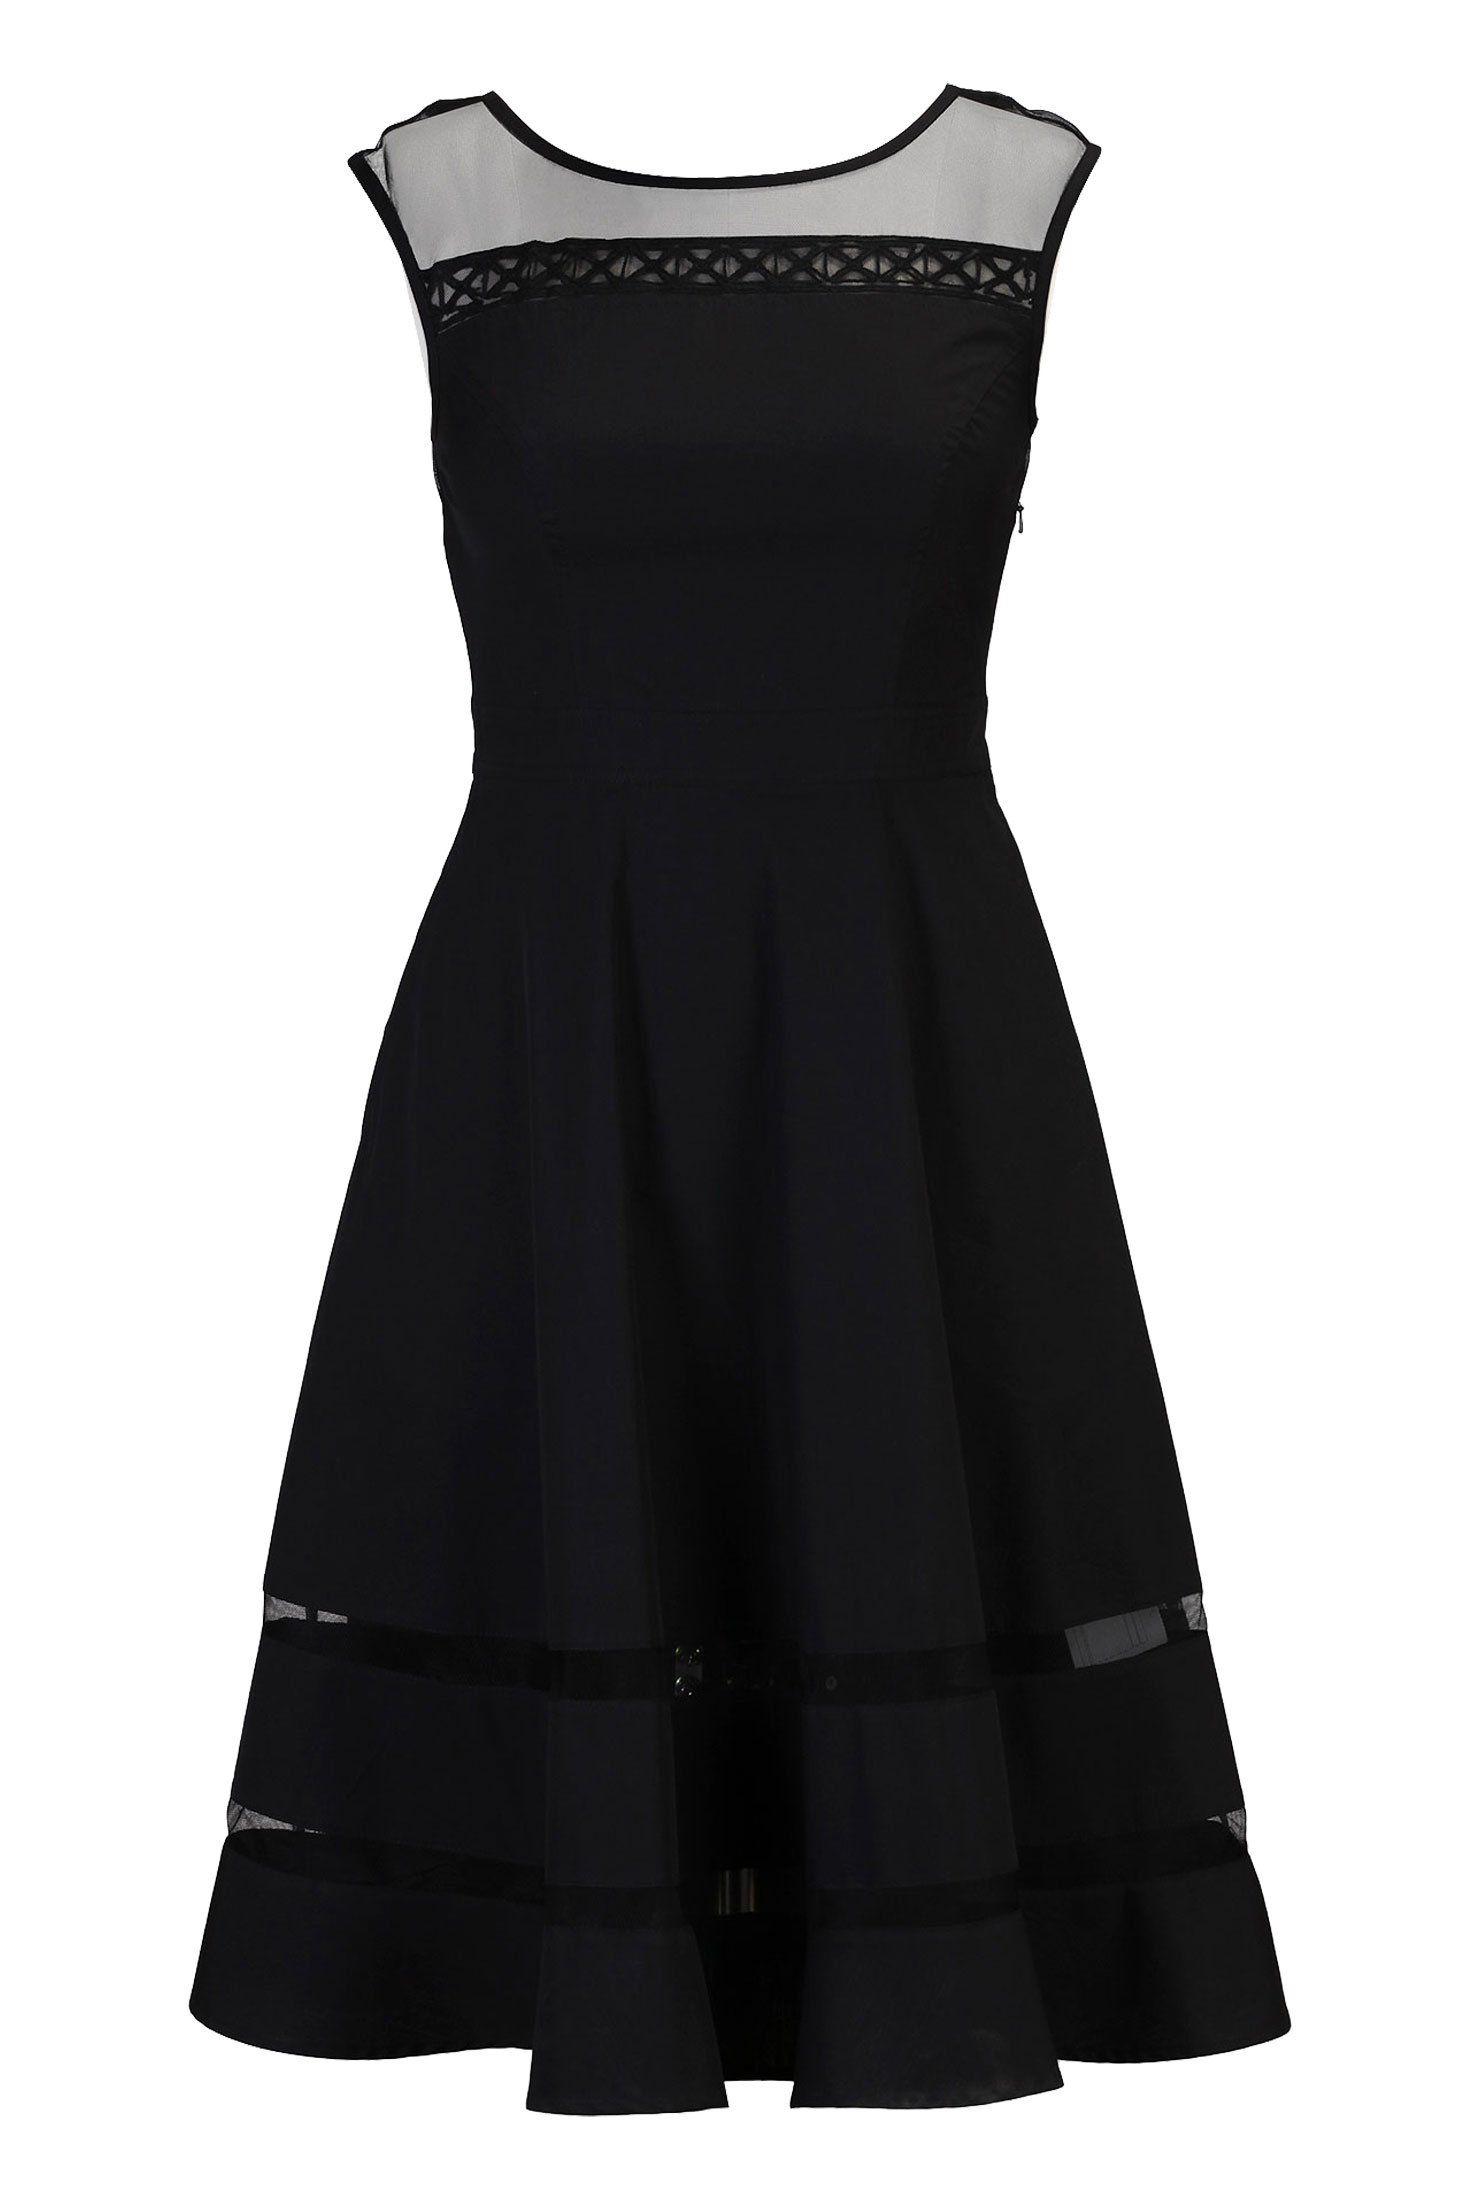 eShakti Women's Illusion embellished yoke poplin dress at Amazon Women's Clothing store: